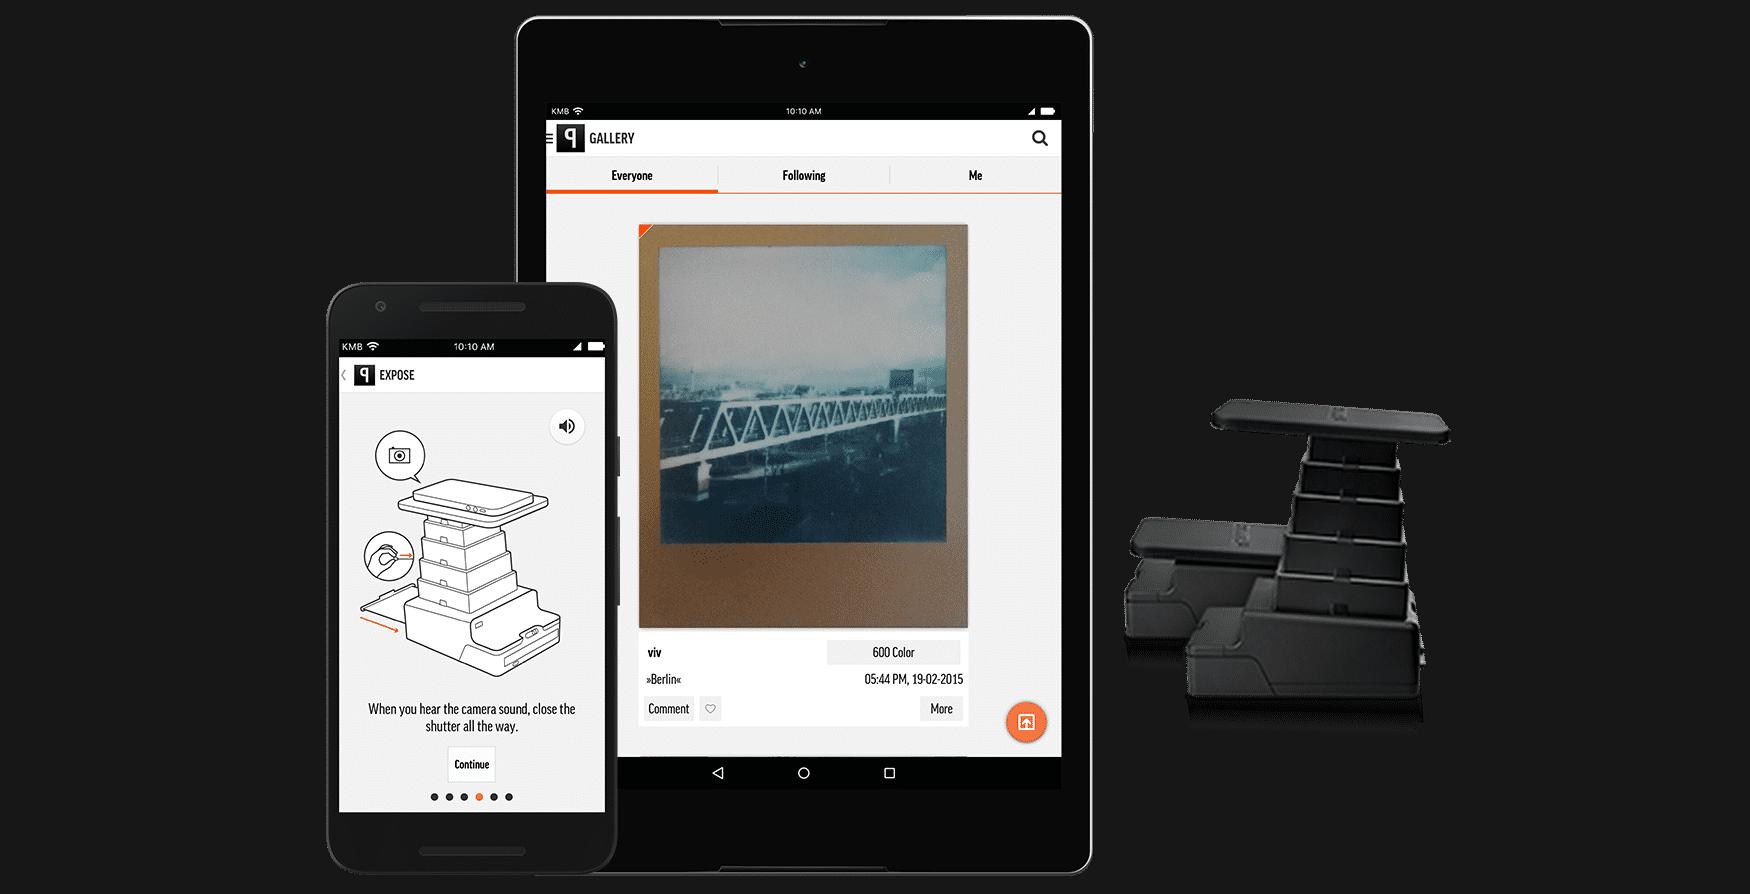 raum gestalten app perfect roomle d ar raumplaner im app store with raum gestalten app tipps. Black Bedroom Furniture Sets. Home Design Ideas